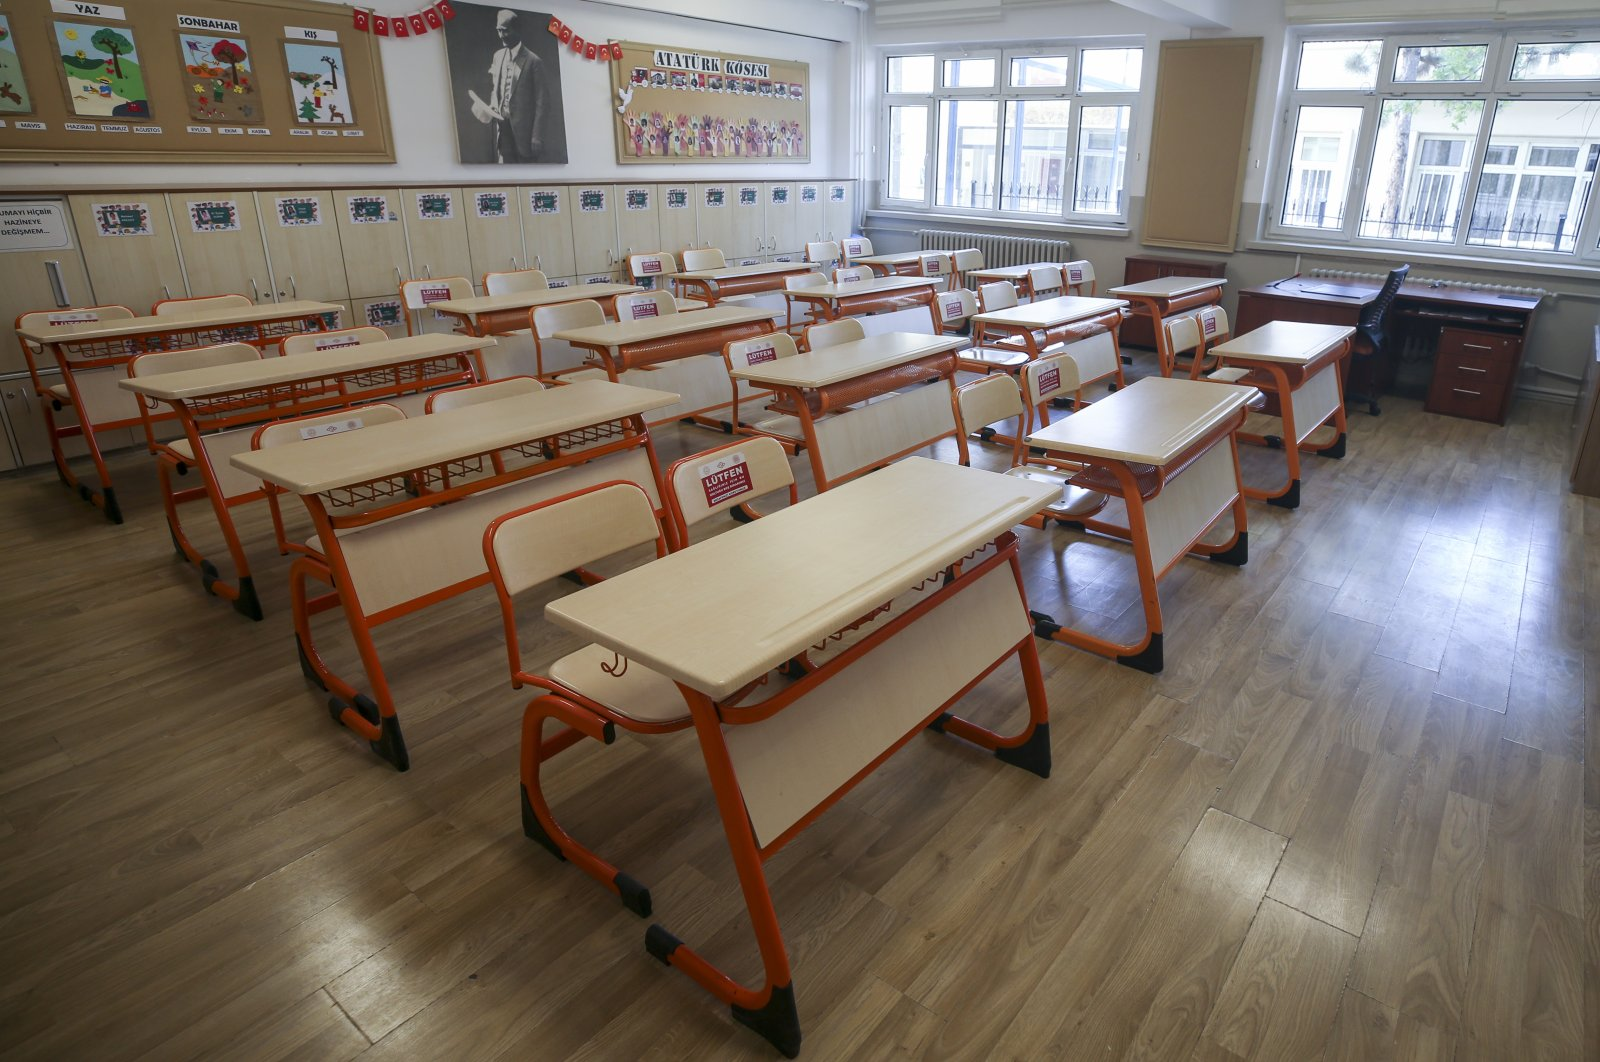 A classroom at the Çankaya Elementary School in the capital Ankara, Turkey, July 27, 2020. (AA Photo)